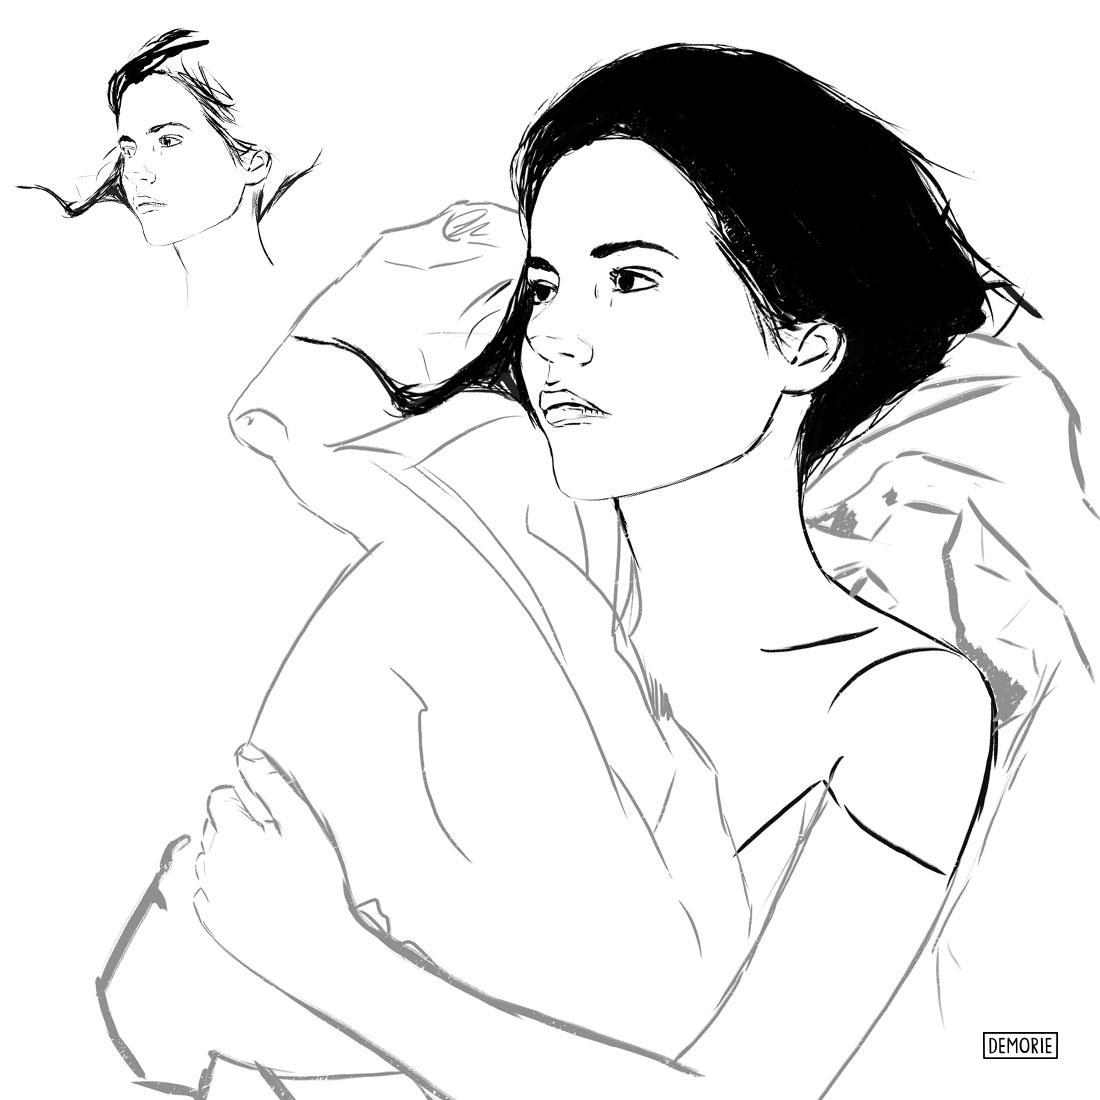 Sleeping - Digital Portrait Drawing